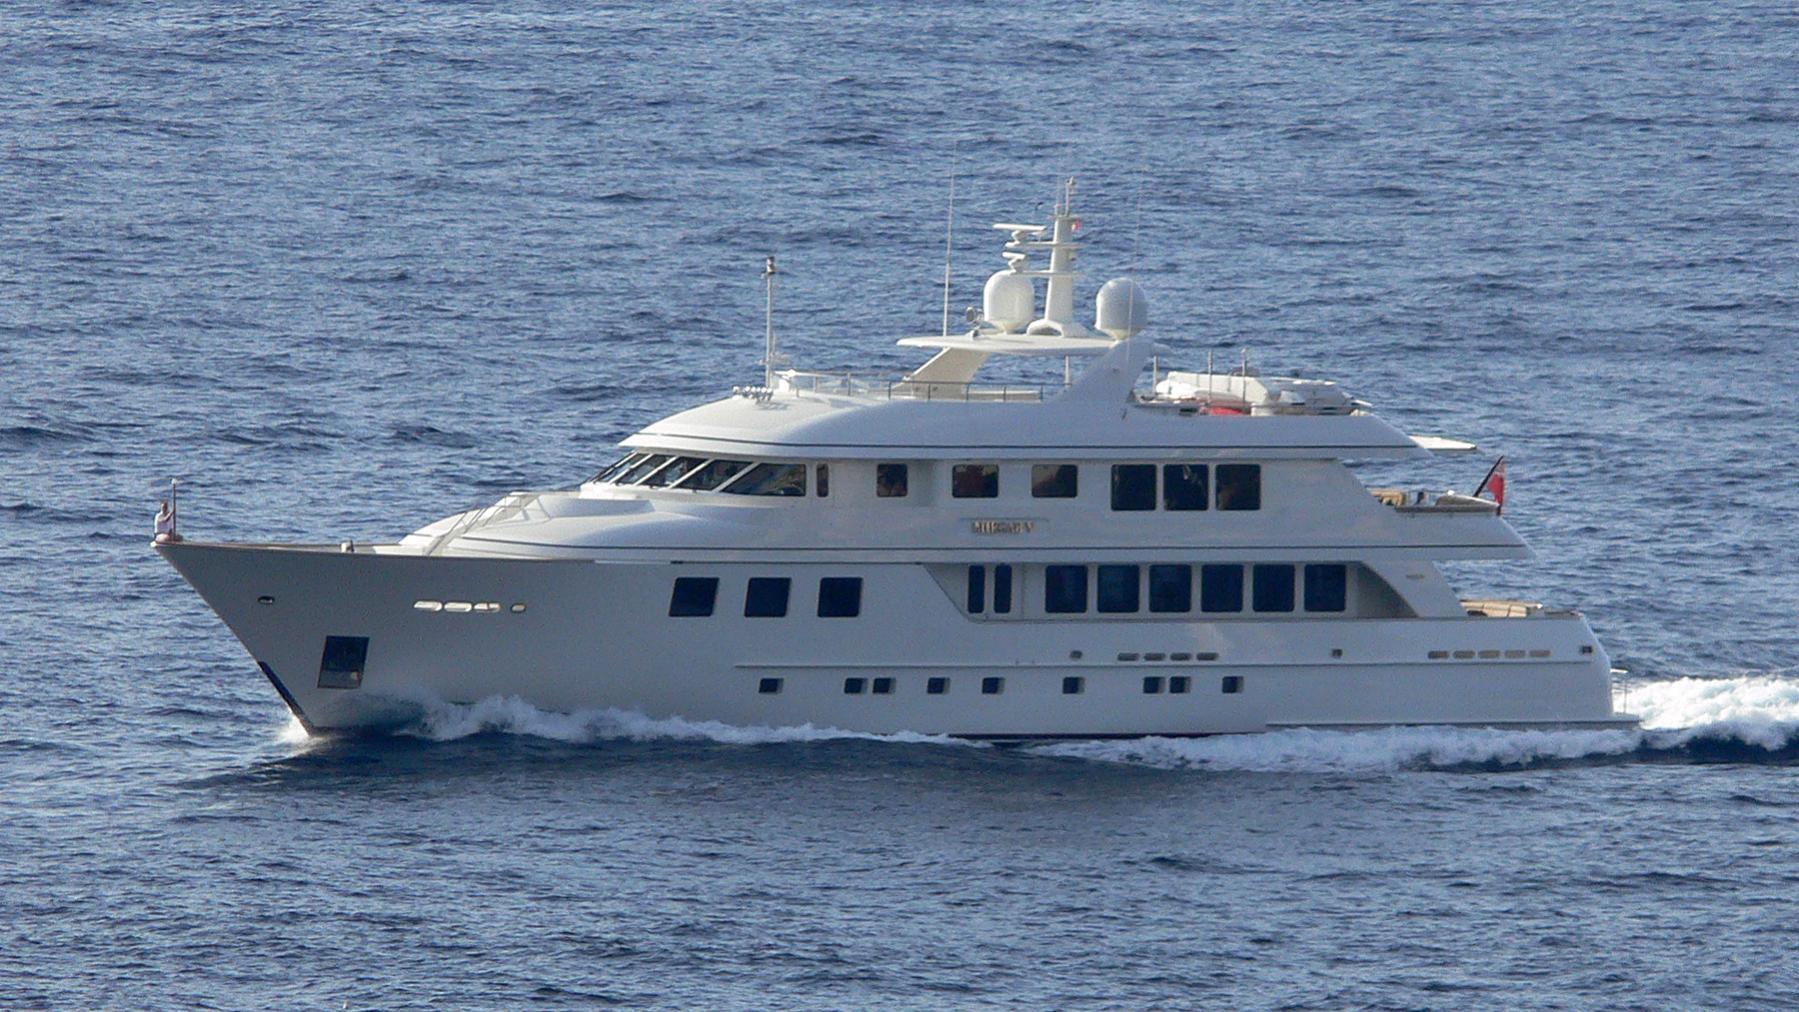 maghreb-v-yacht-exterior